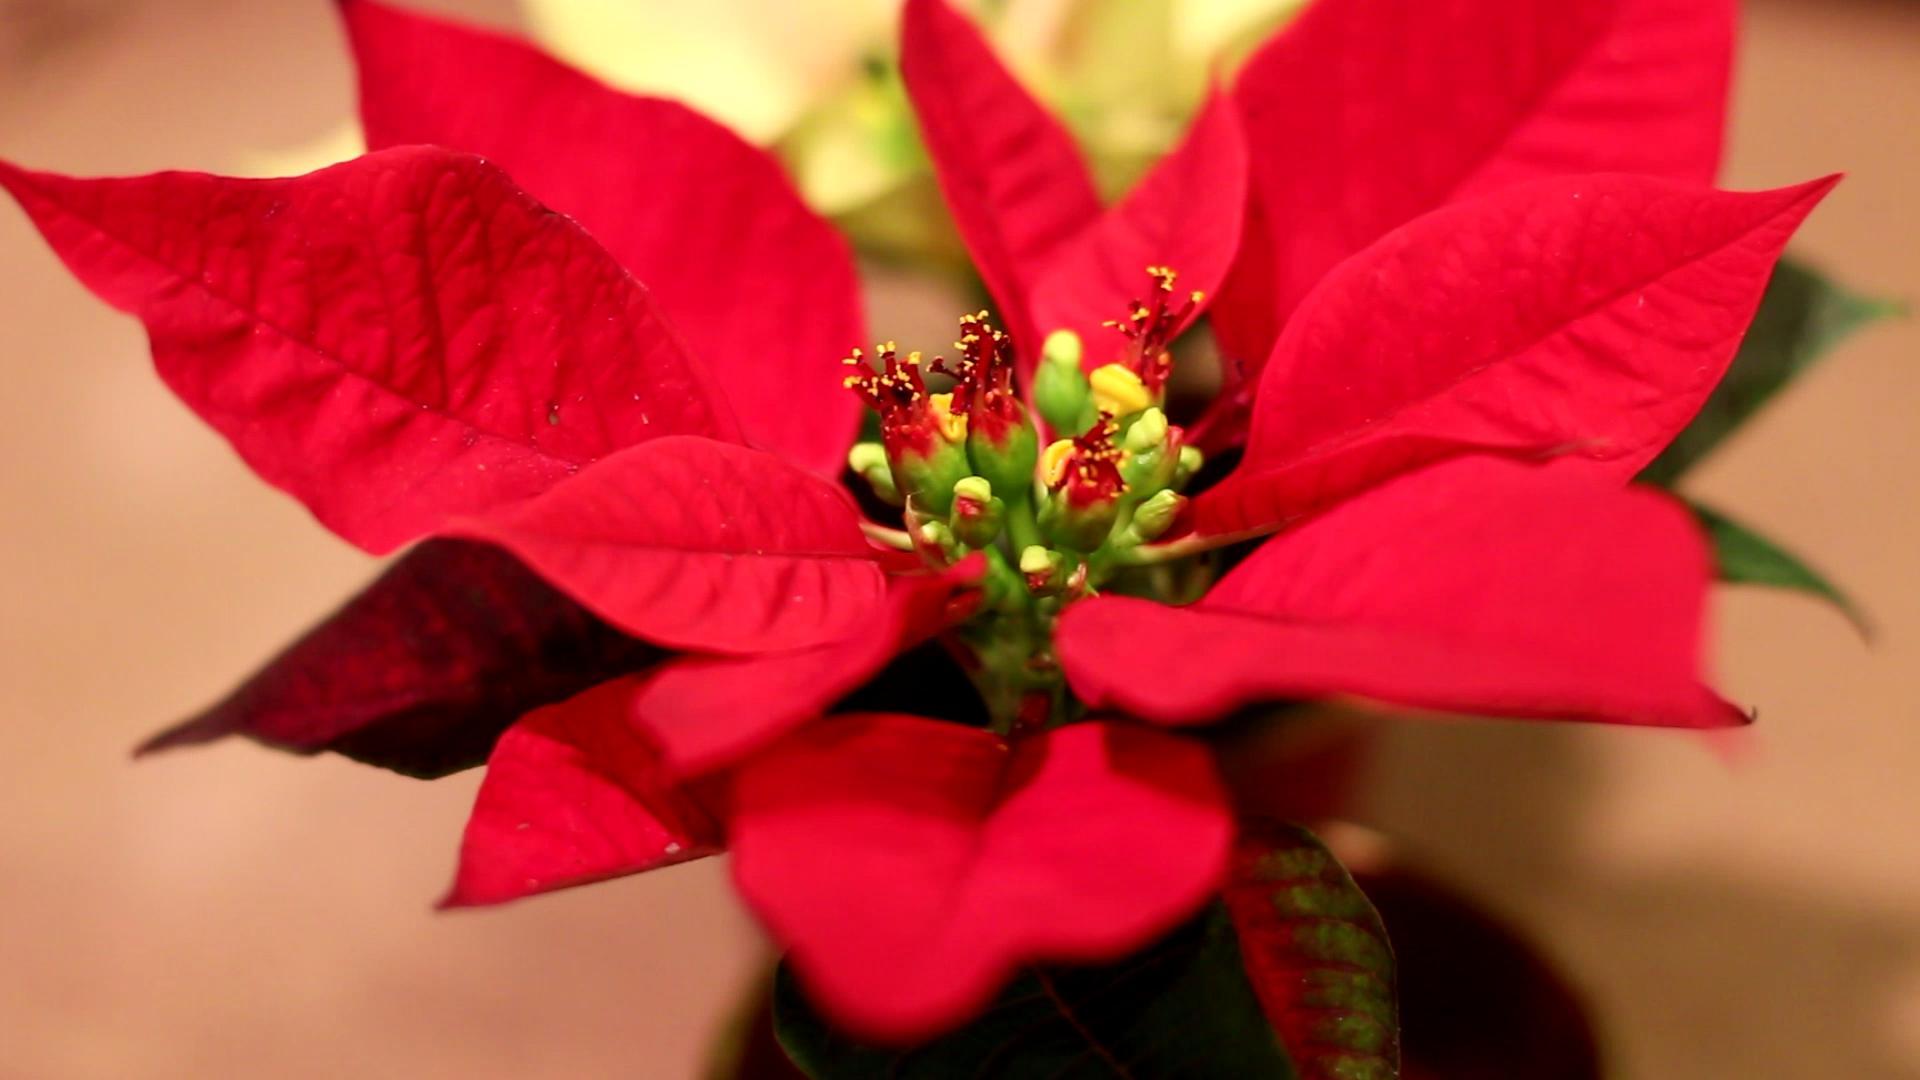 Poinsettia plant landscaper Crownsville MD